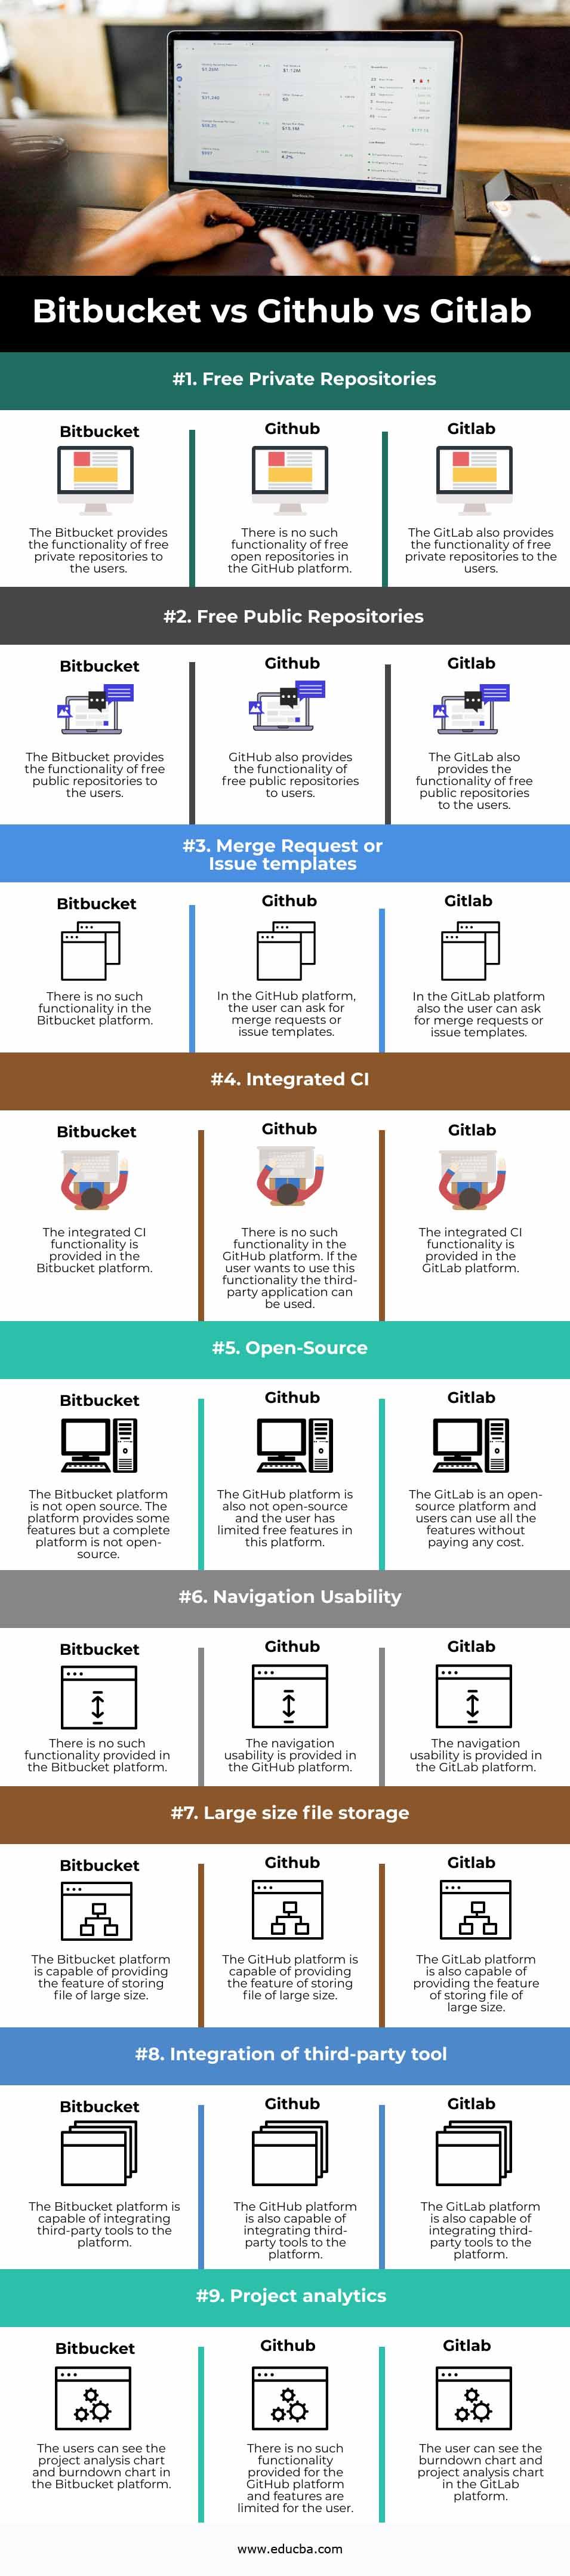 Bitbucket vs Github vs Gitlab info